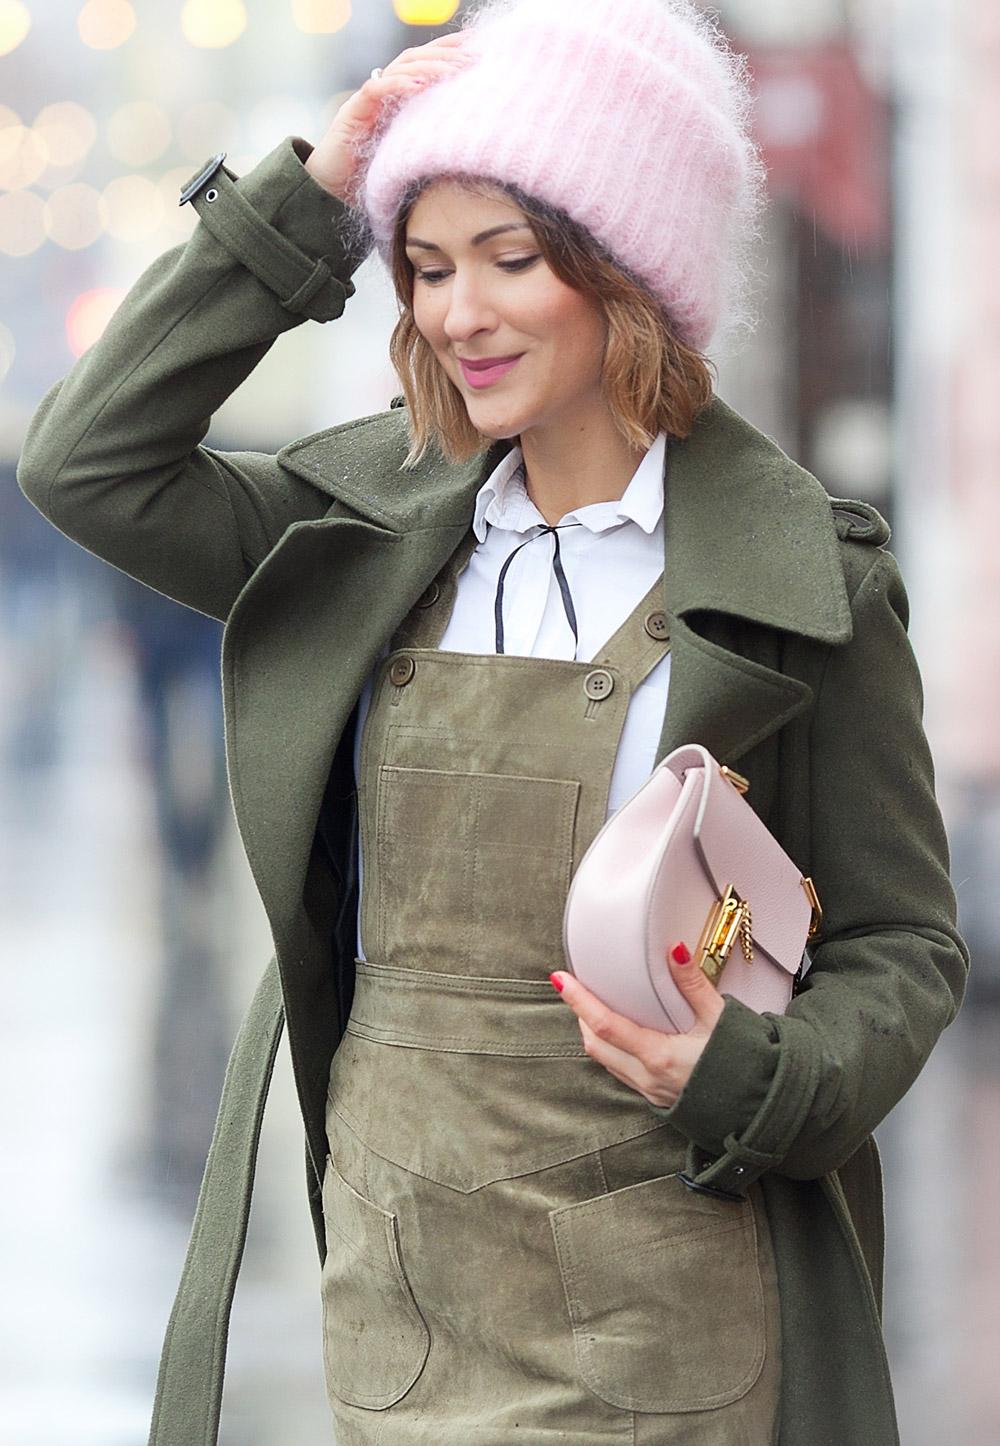 ellena-galant-girl-street-style-fashion-blogger